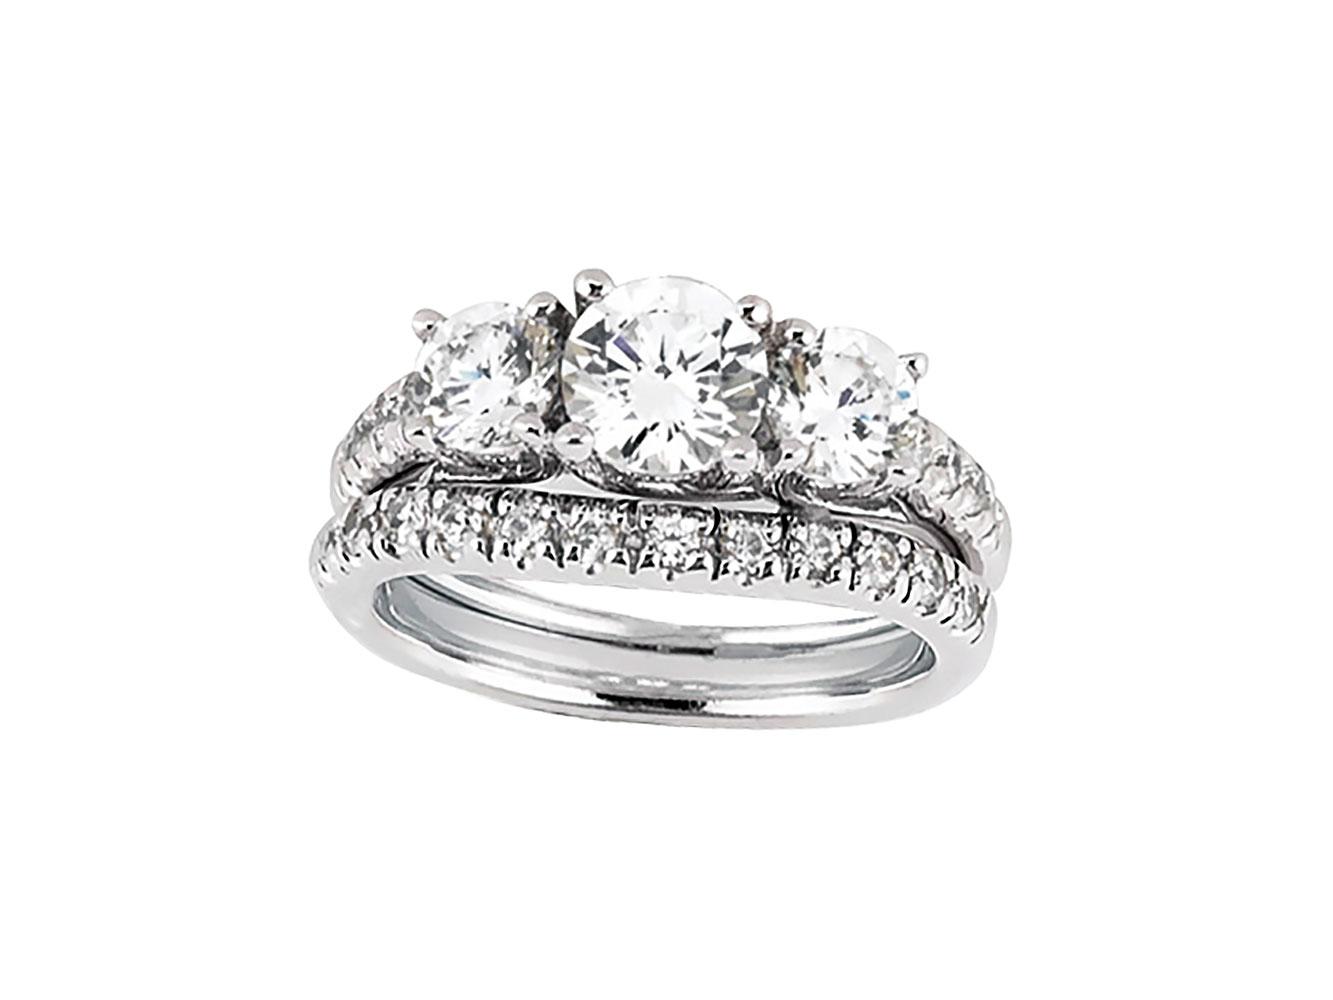 1 50ct Round Cut Diamond Engagement Ring Wedding Band Set Solid 10k